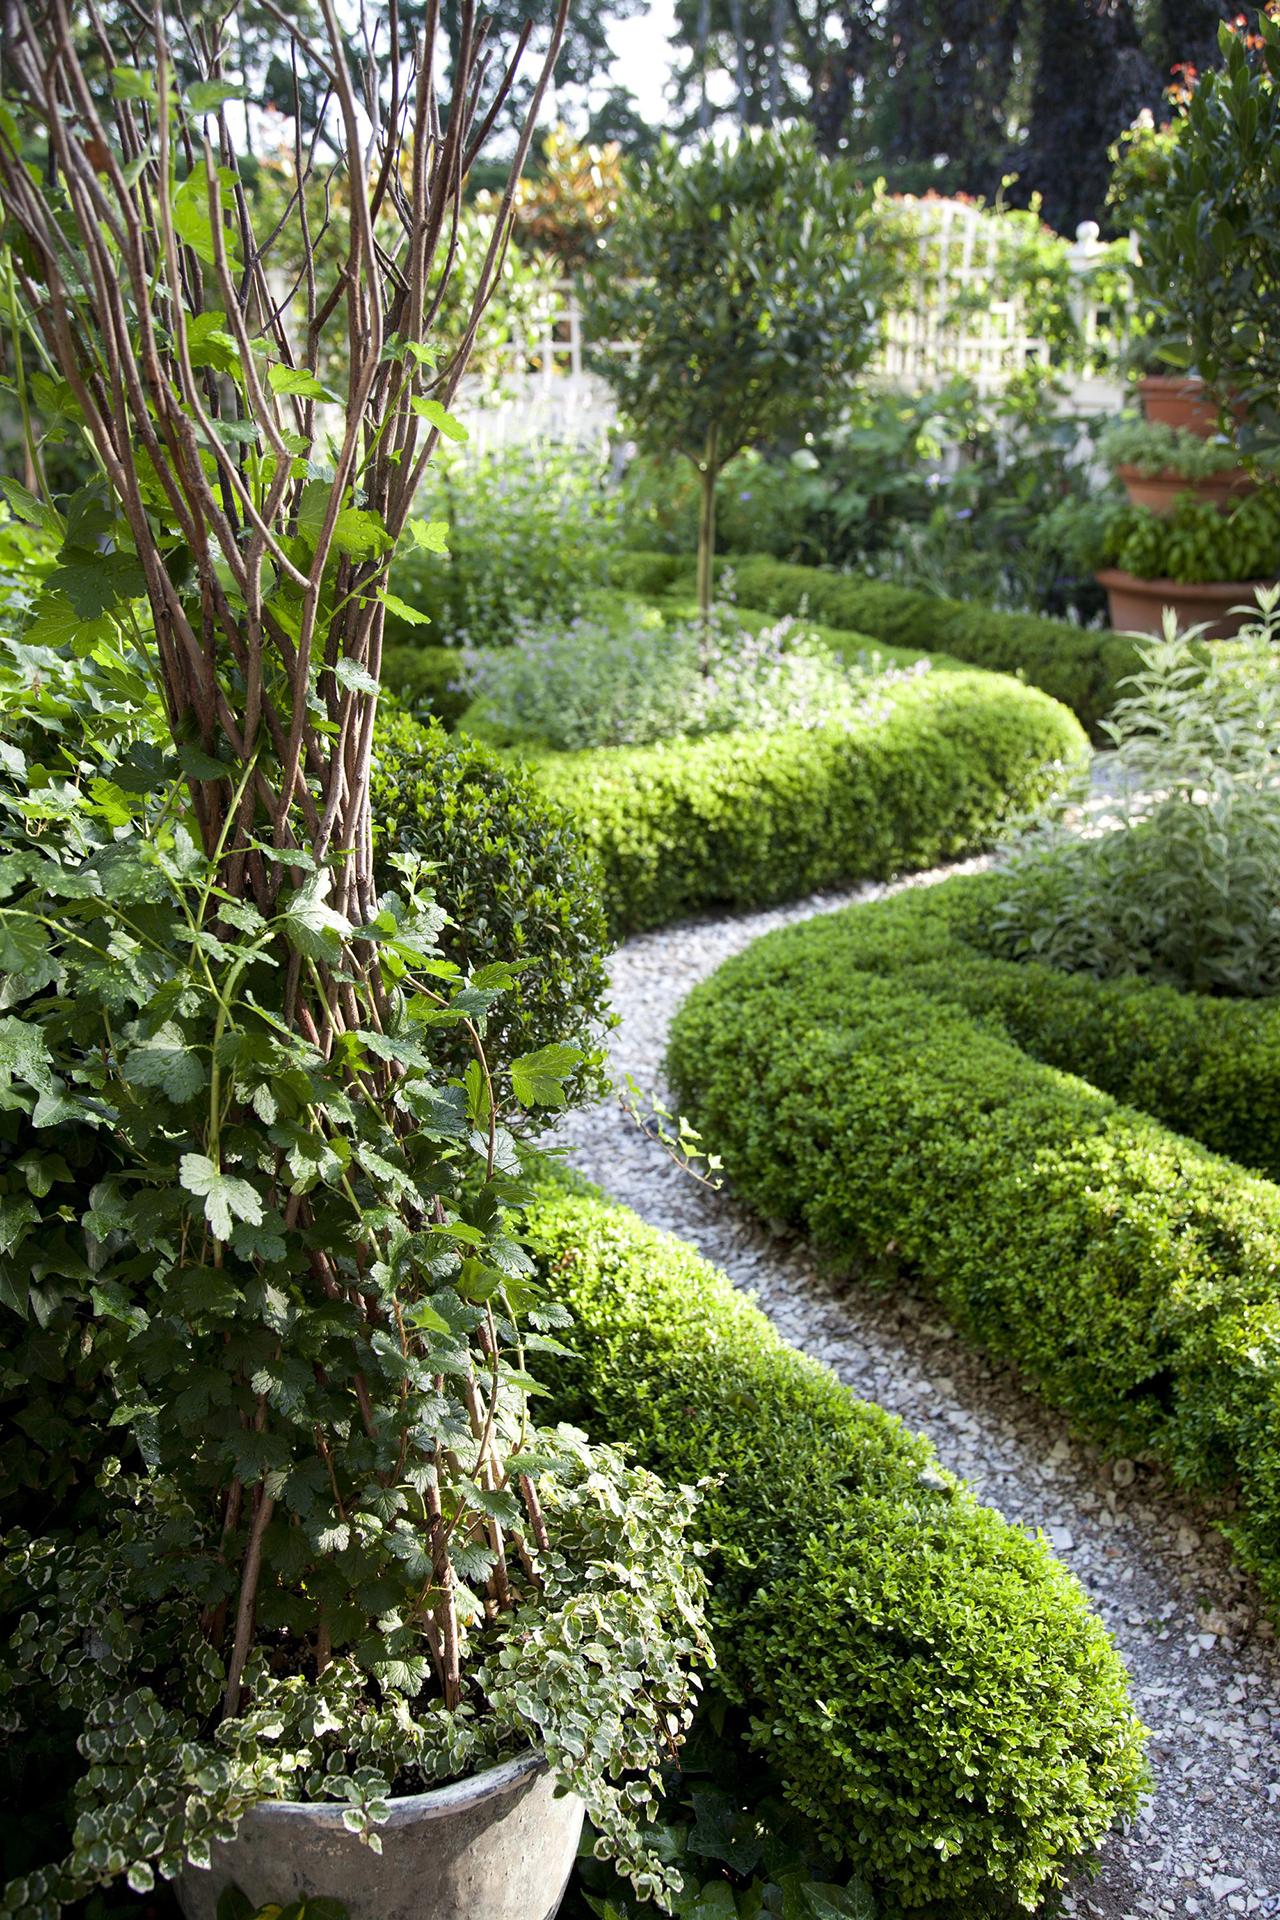 stunning small garden plans #BackyardLandscapingIdeas #Garden #GardenIdeas